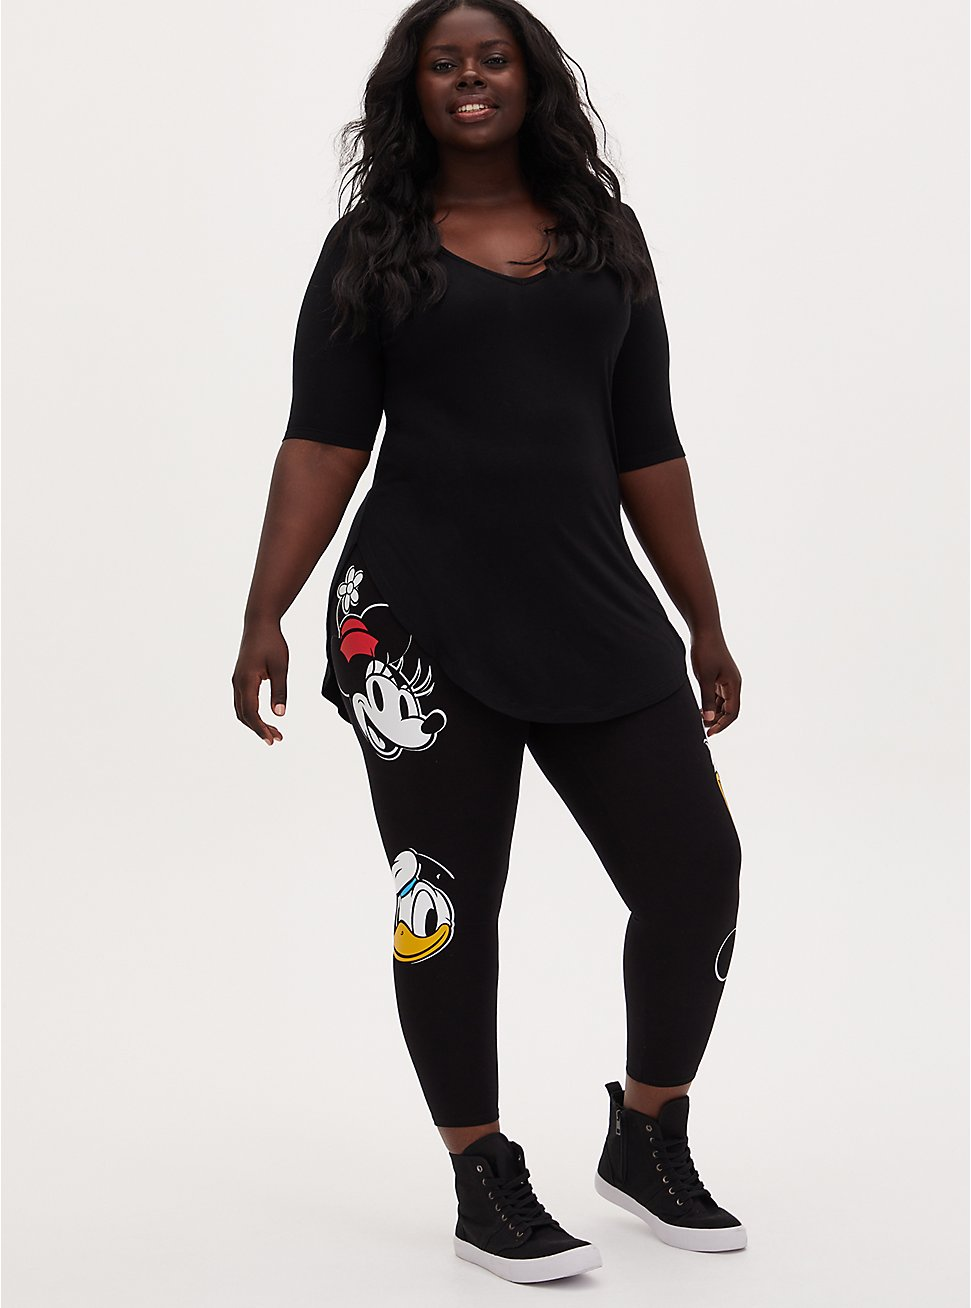 Plus Size Disney Mickey Mouse & Friends Black Crop Legging, DEEP BLACK, hi-res